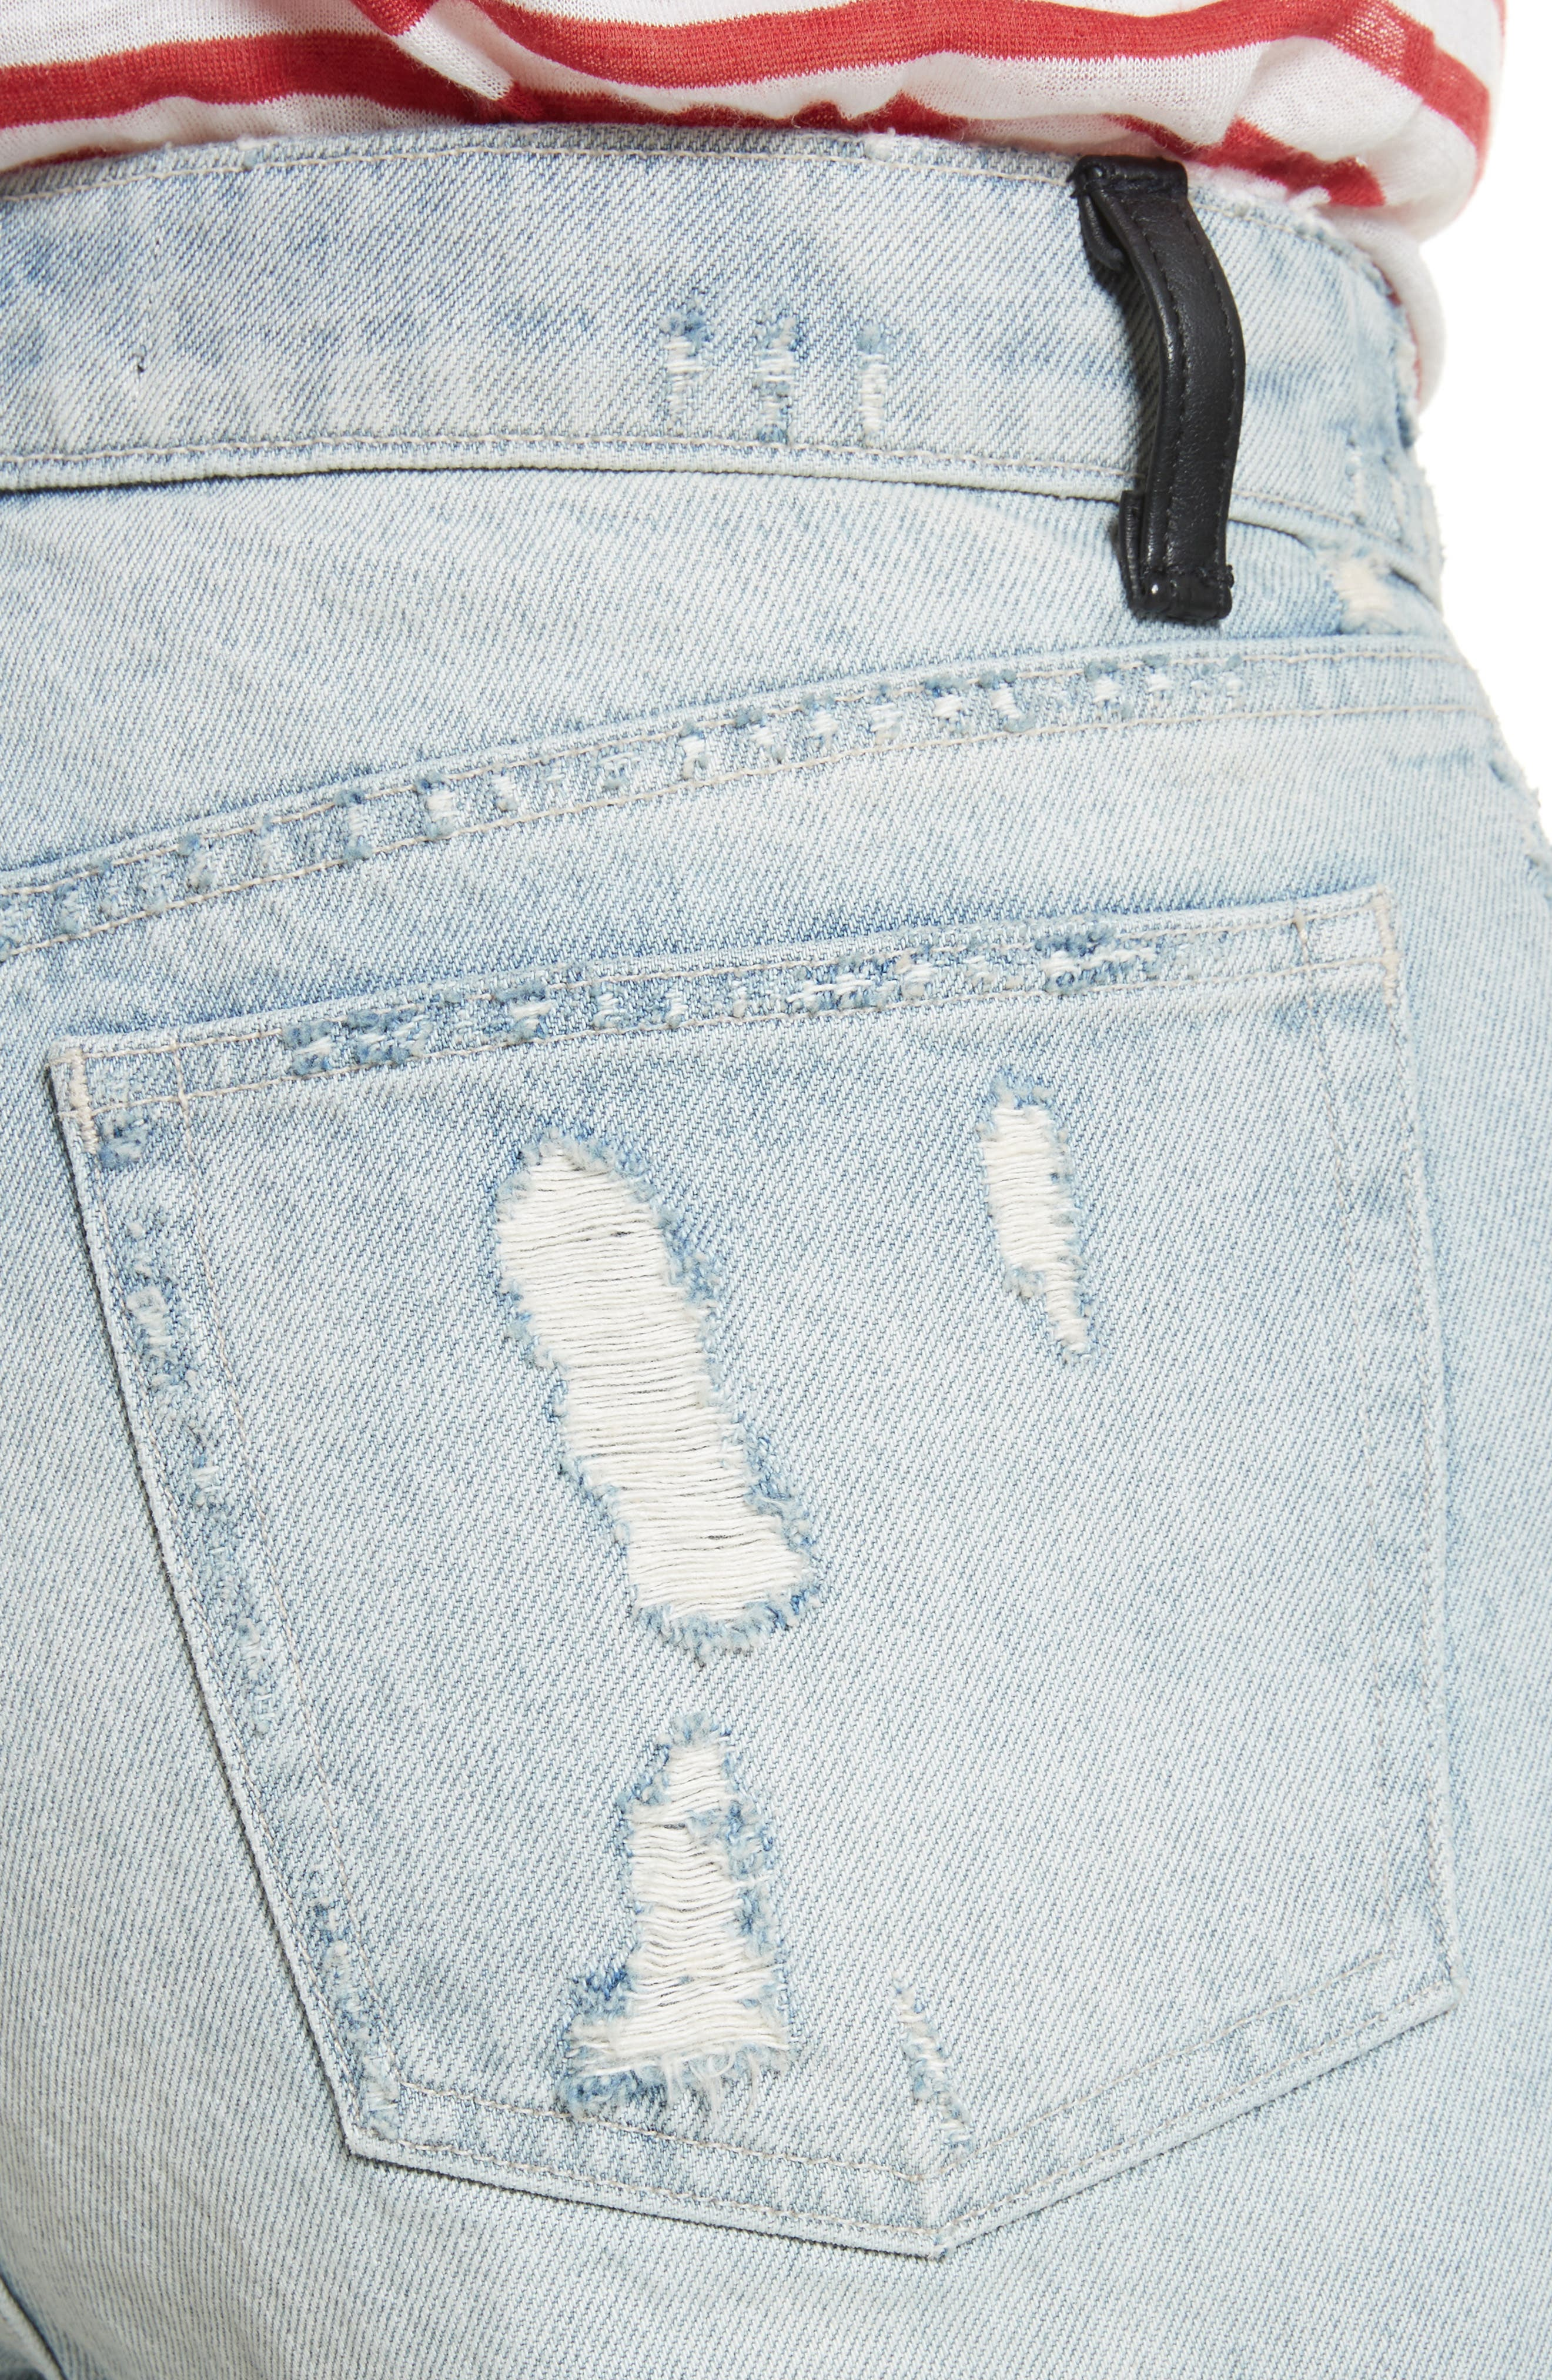 Distressed Boyfriend Jeans,                             Alternate thumbnail 4, color,